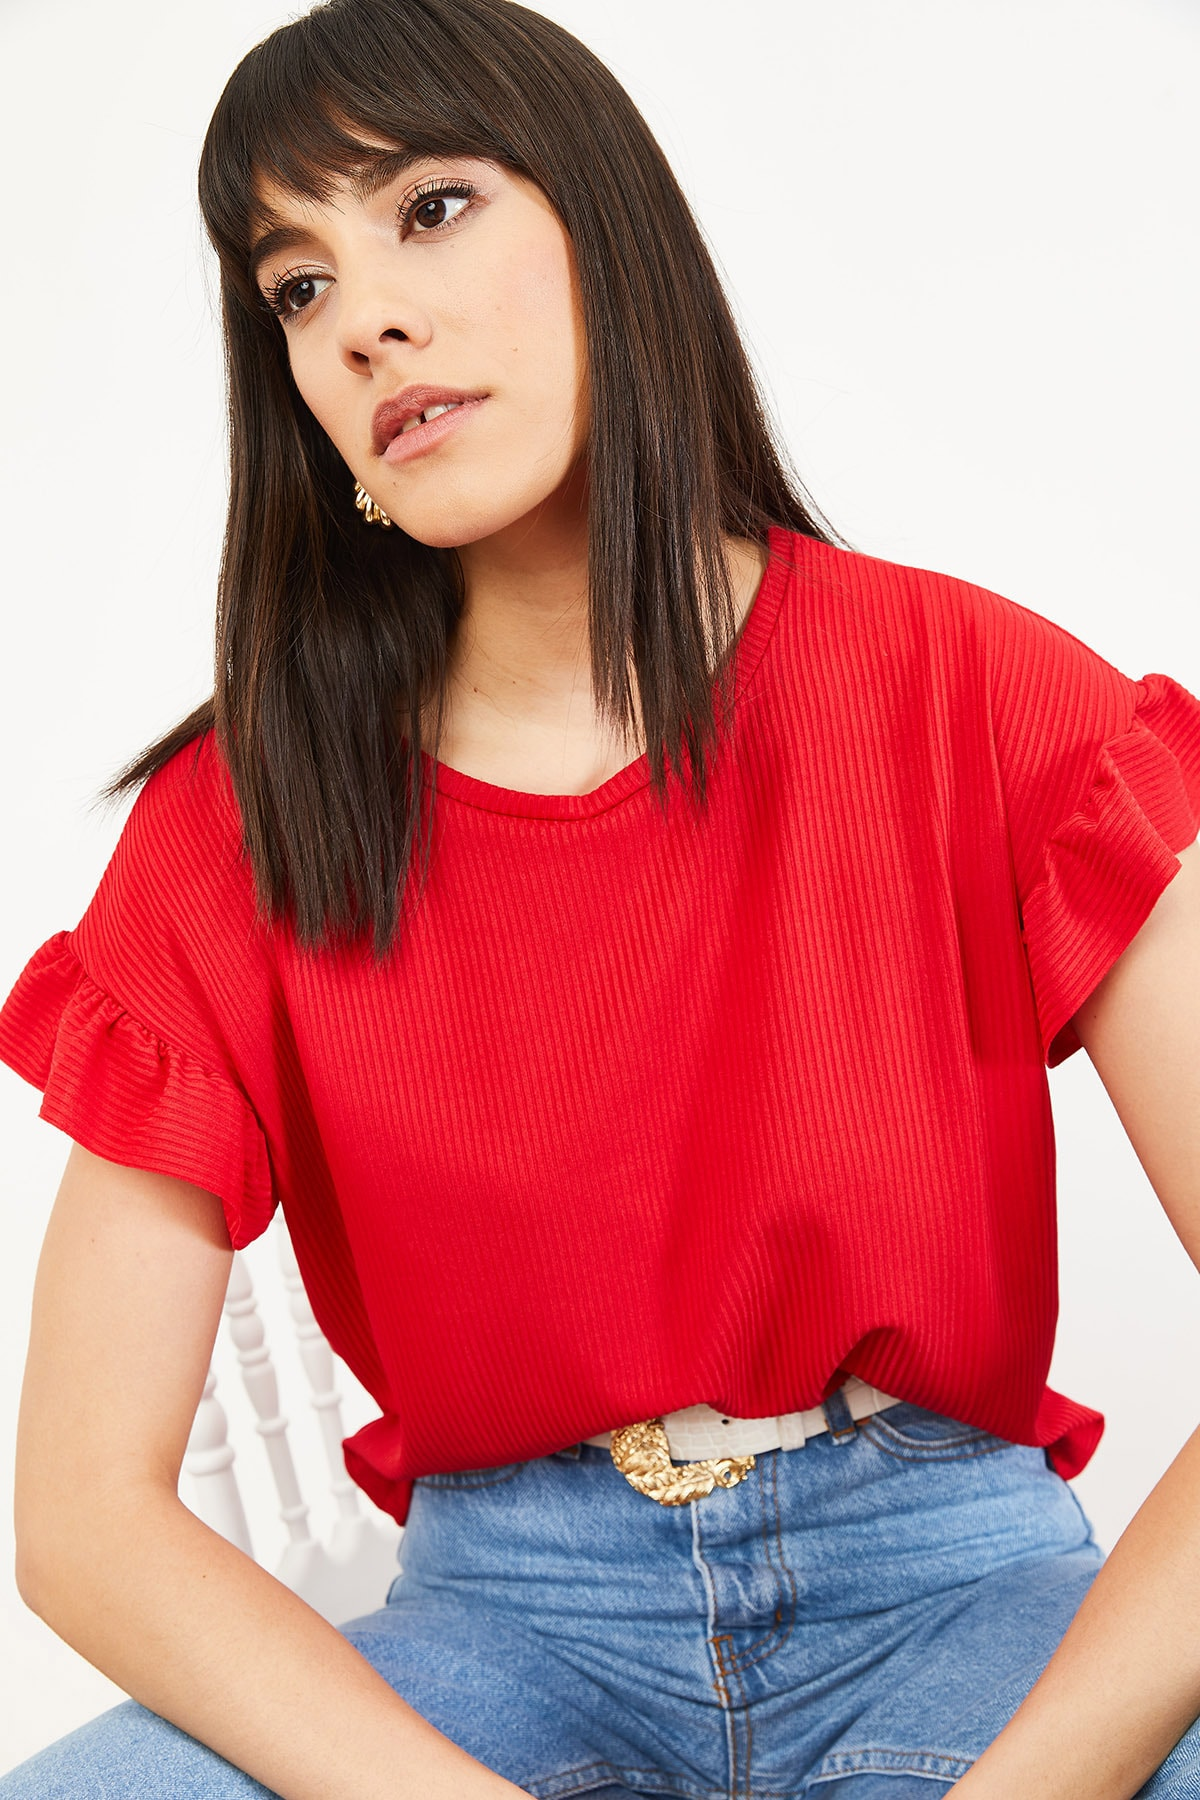 Bianco Lucci Kadın Kırmızı Kolu Fırfırlı Kaşkorse Bluz 10051015 4